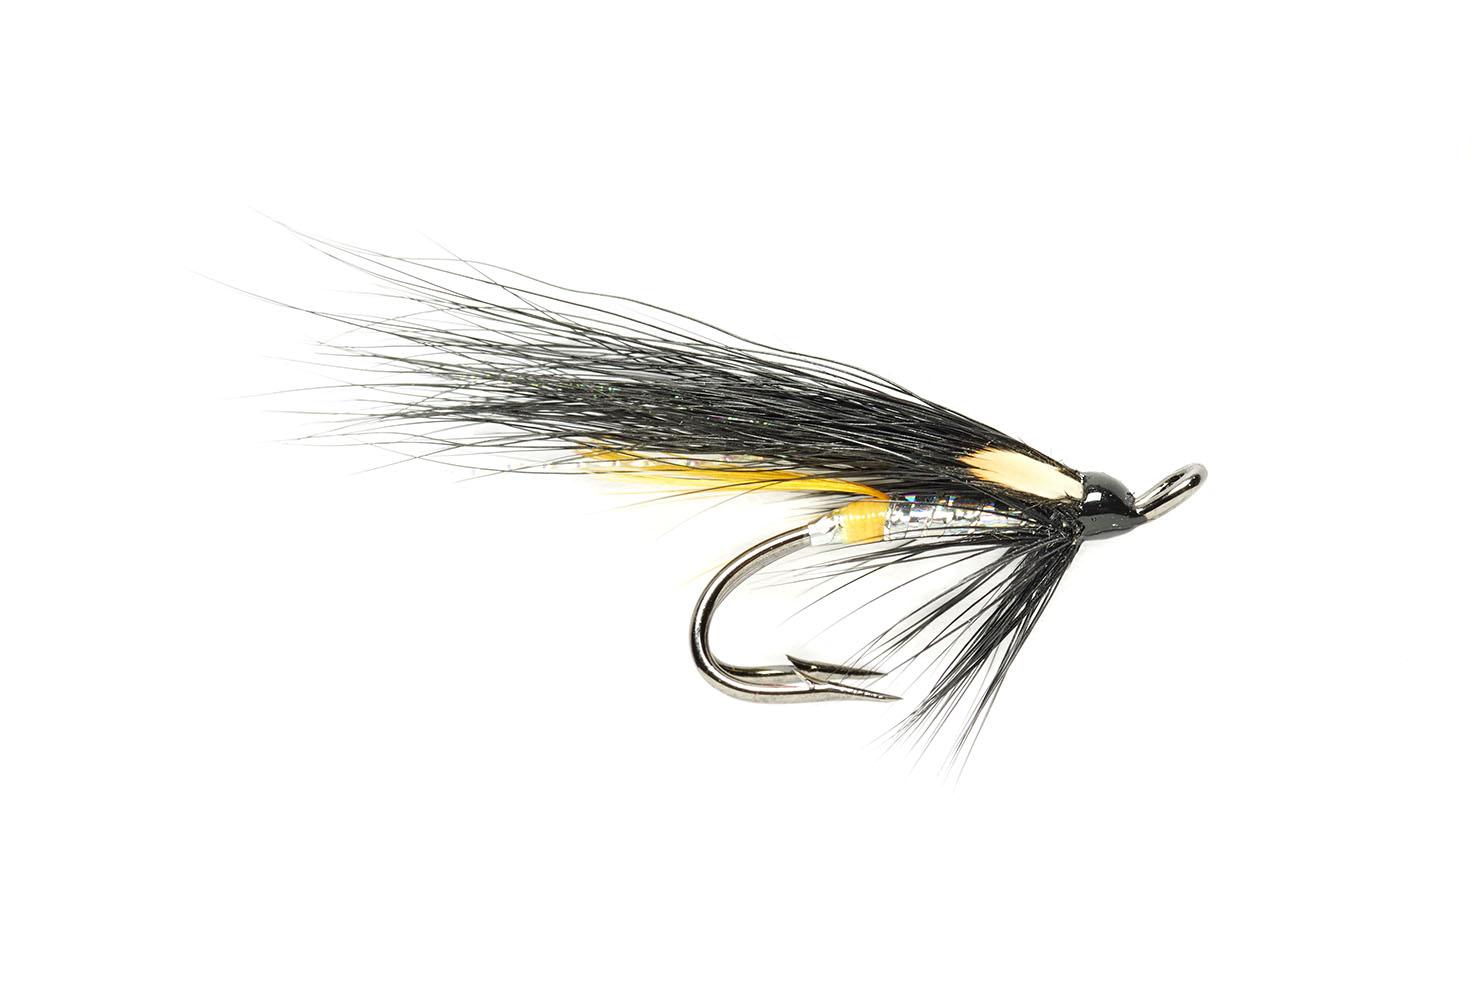 Low water salmon flies